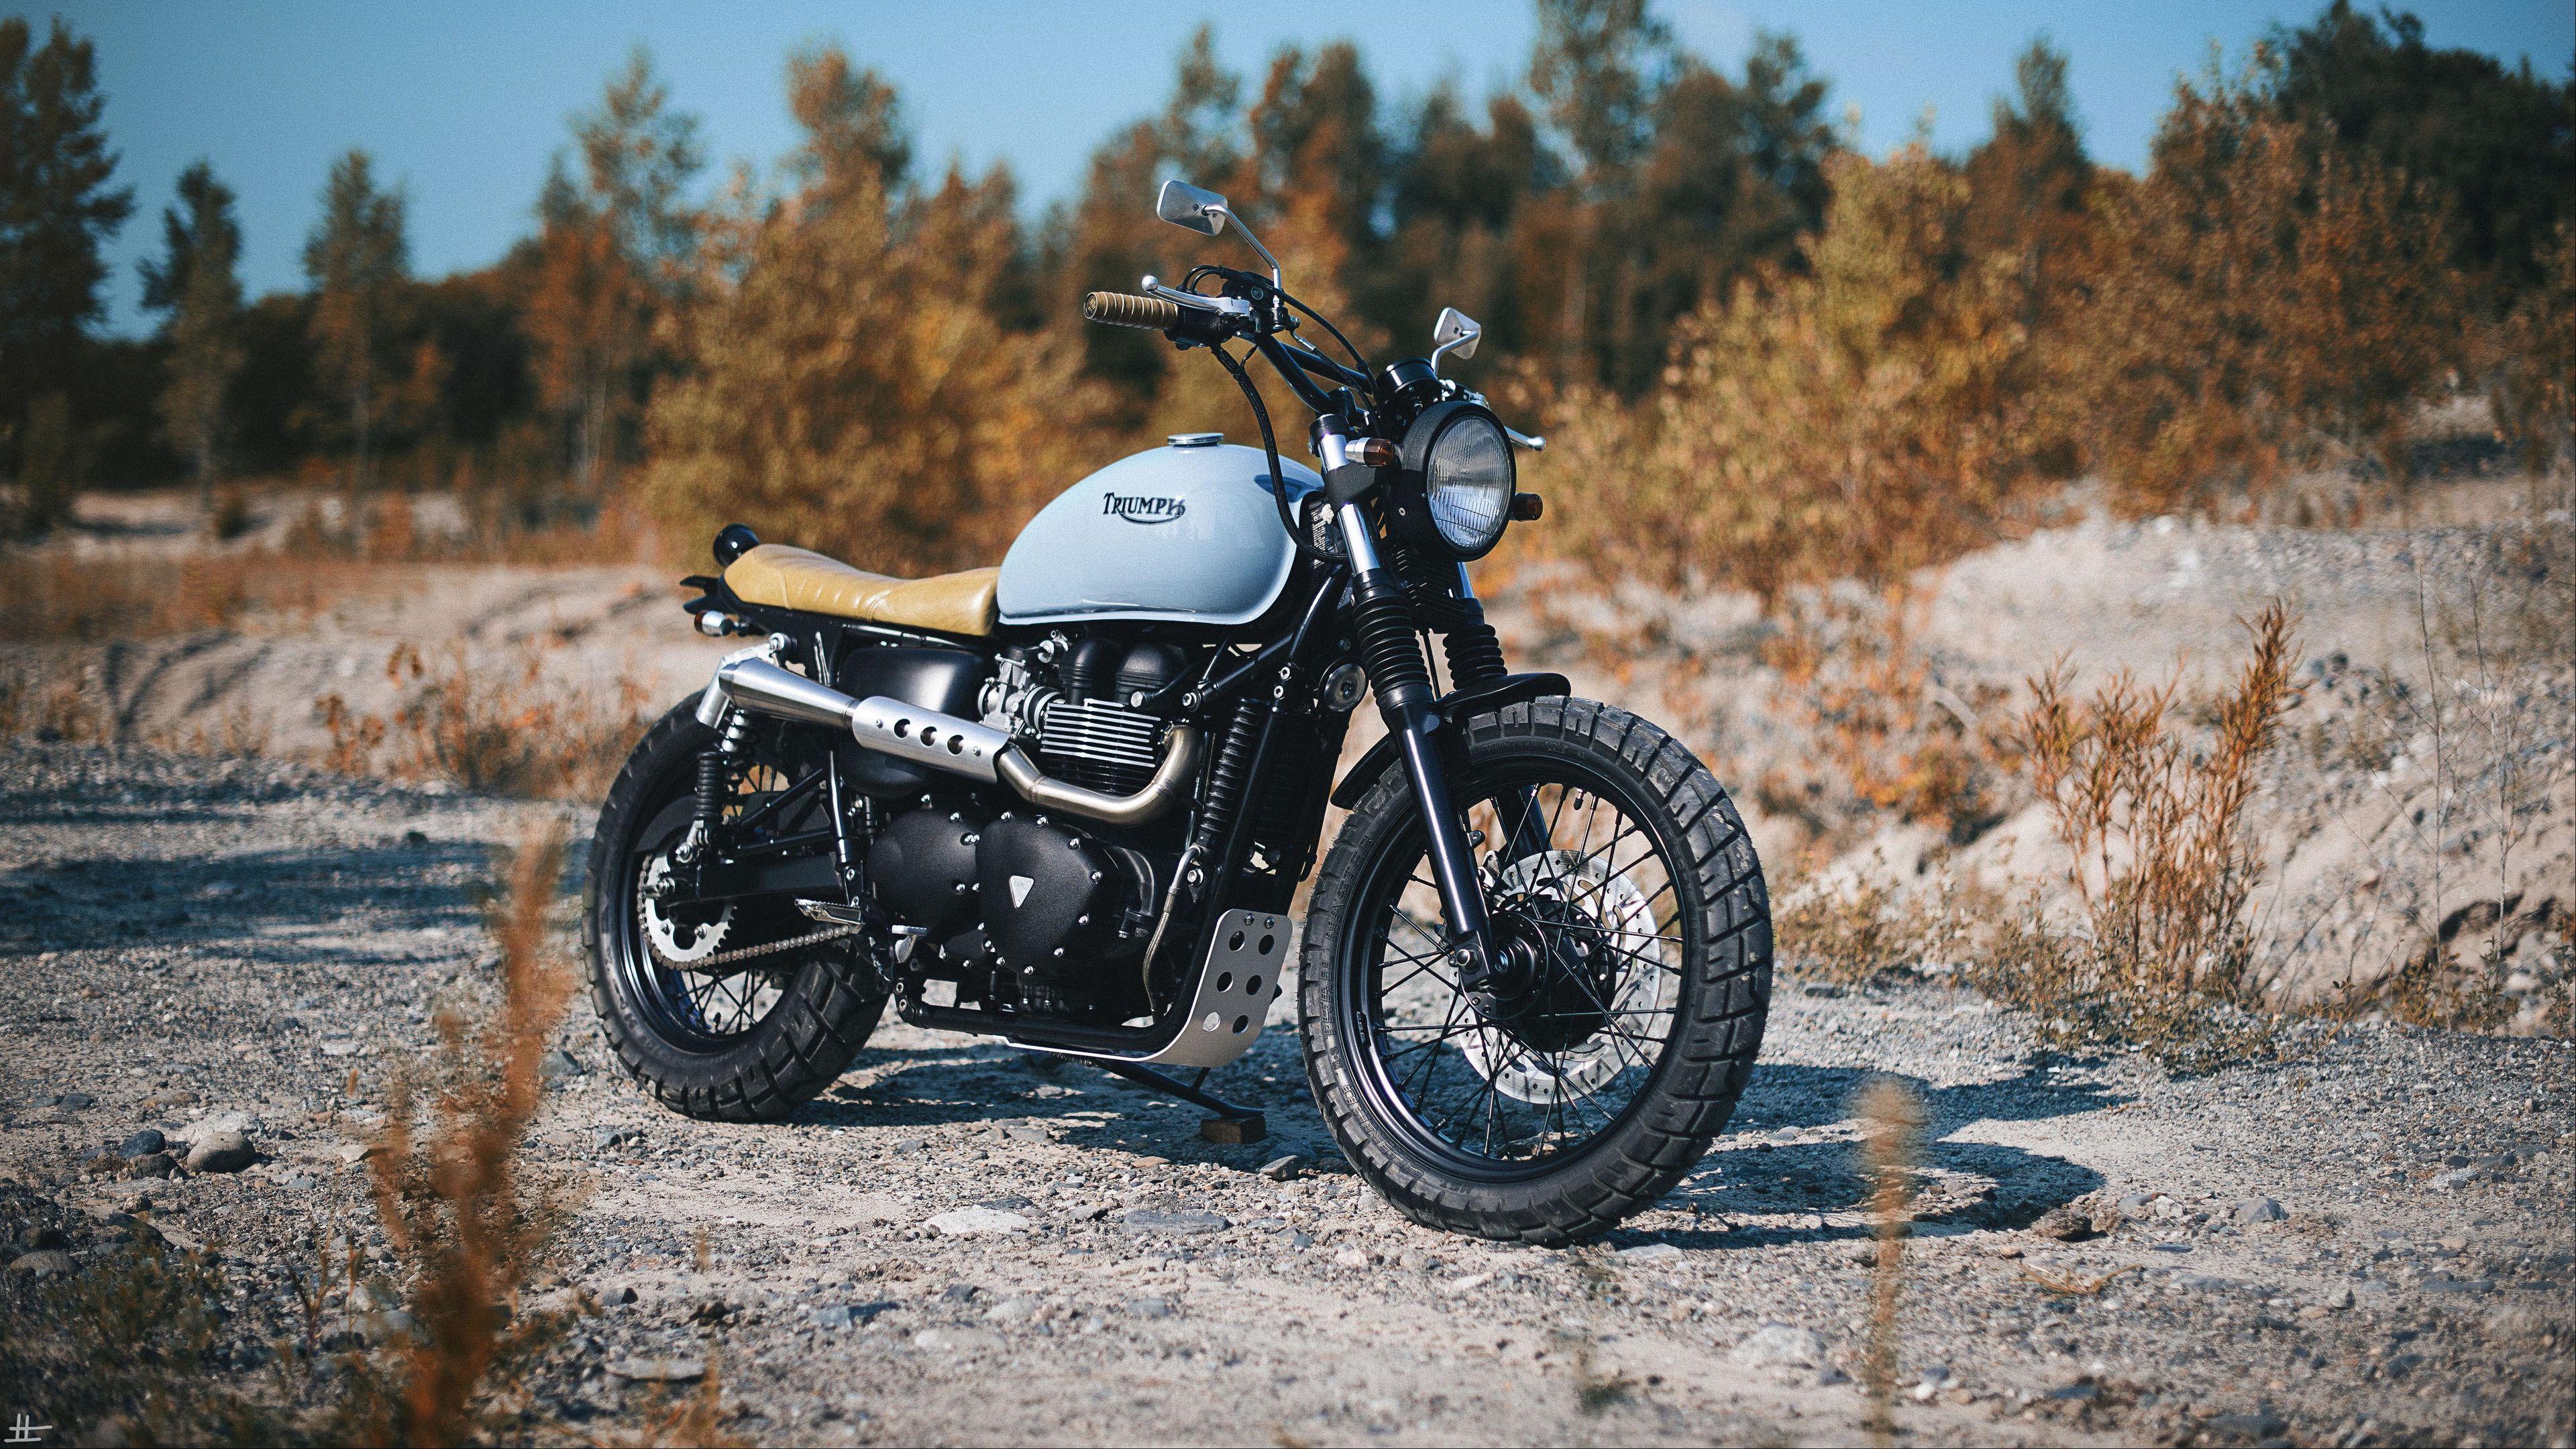 3840x2160 Обои triumph, bonneville, мотоцикл, вид сбоку